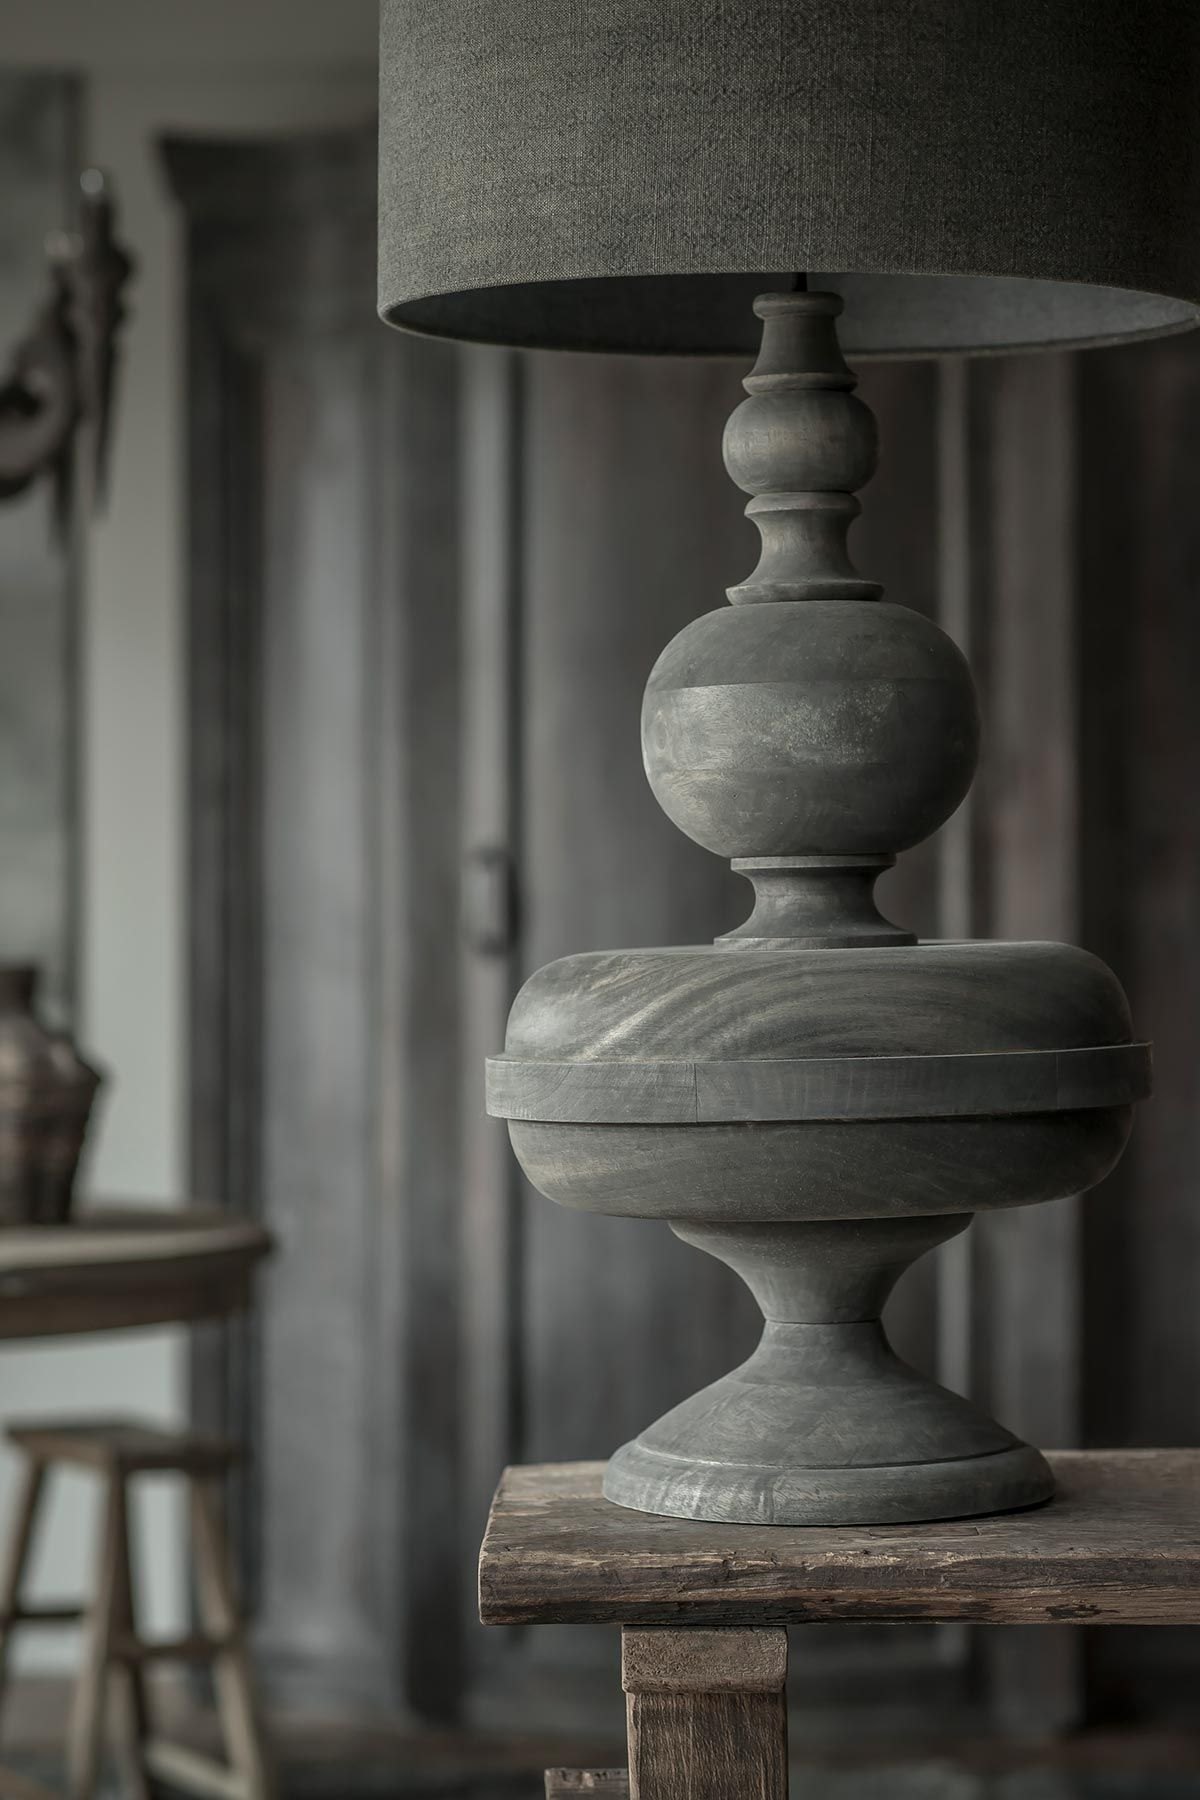 Tafellamp bolvoet hoffz hollandse for Landelijk wonen verlichting